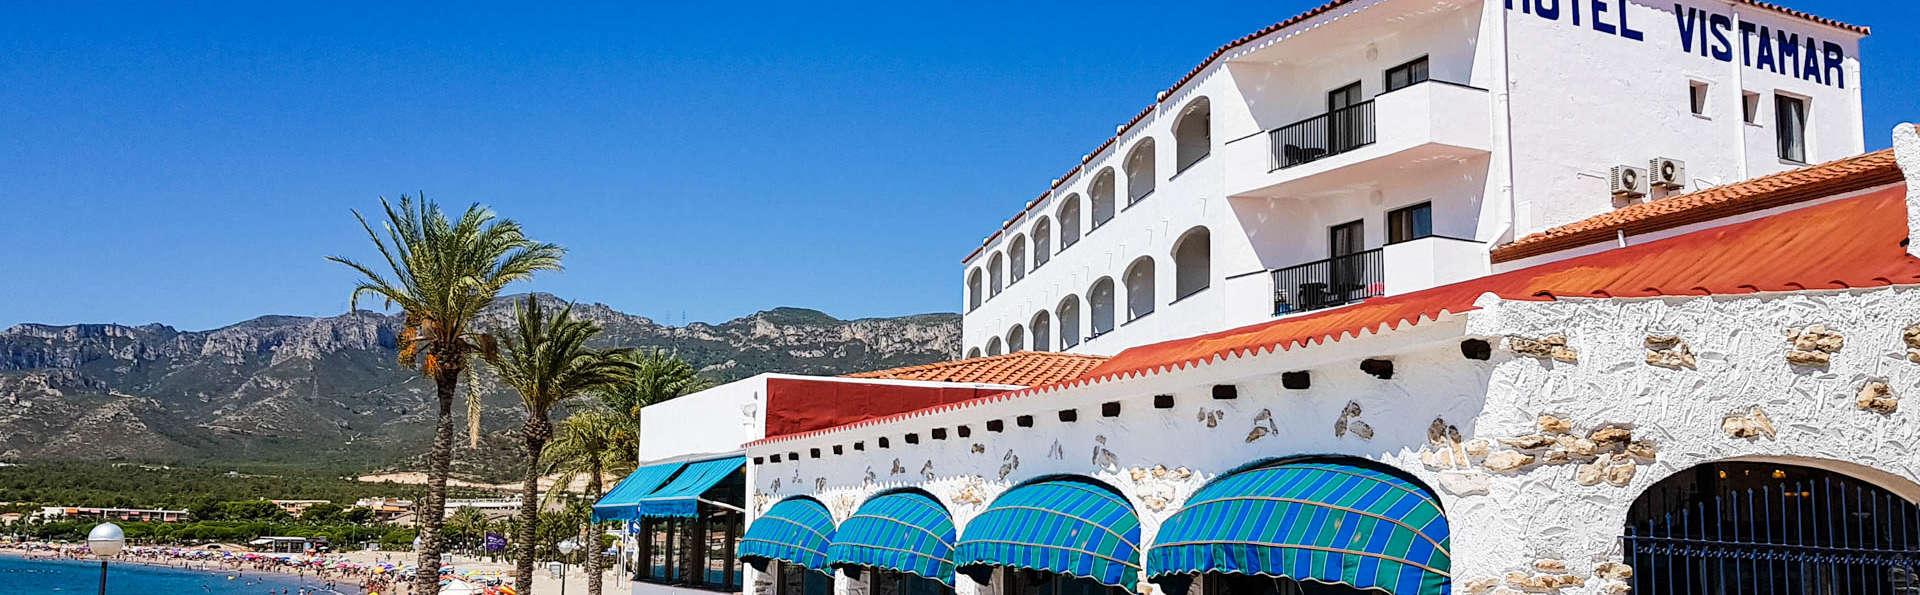 Hotel Vistamar - EDIT_NEW_EXTERIOR-7.jpg